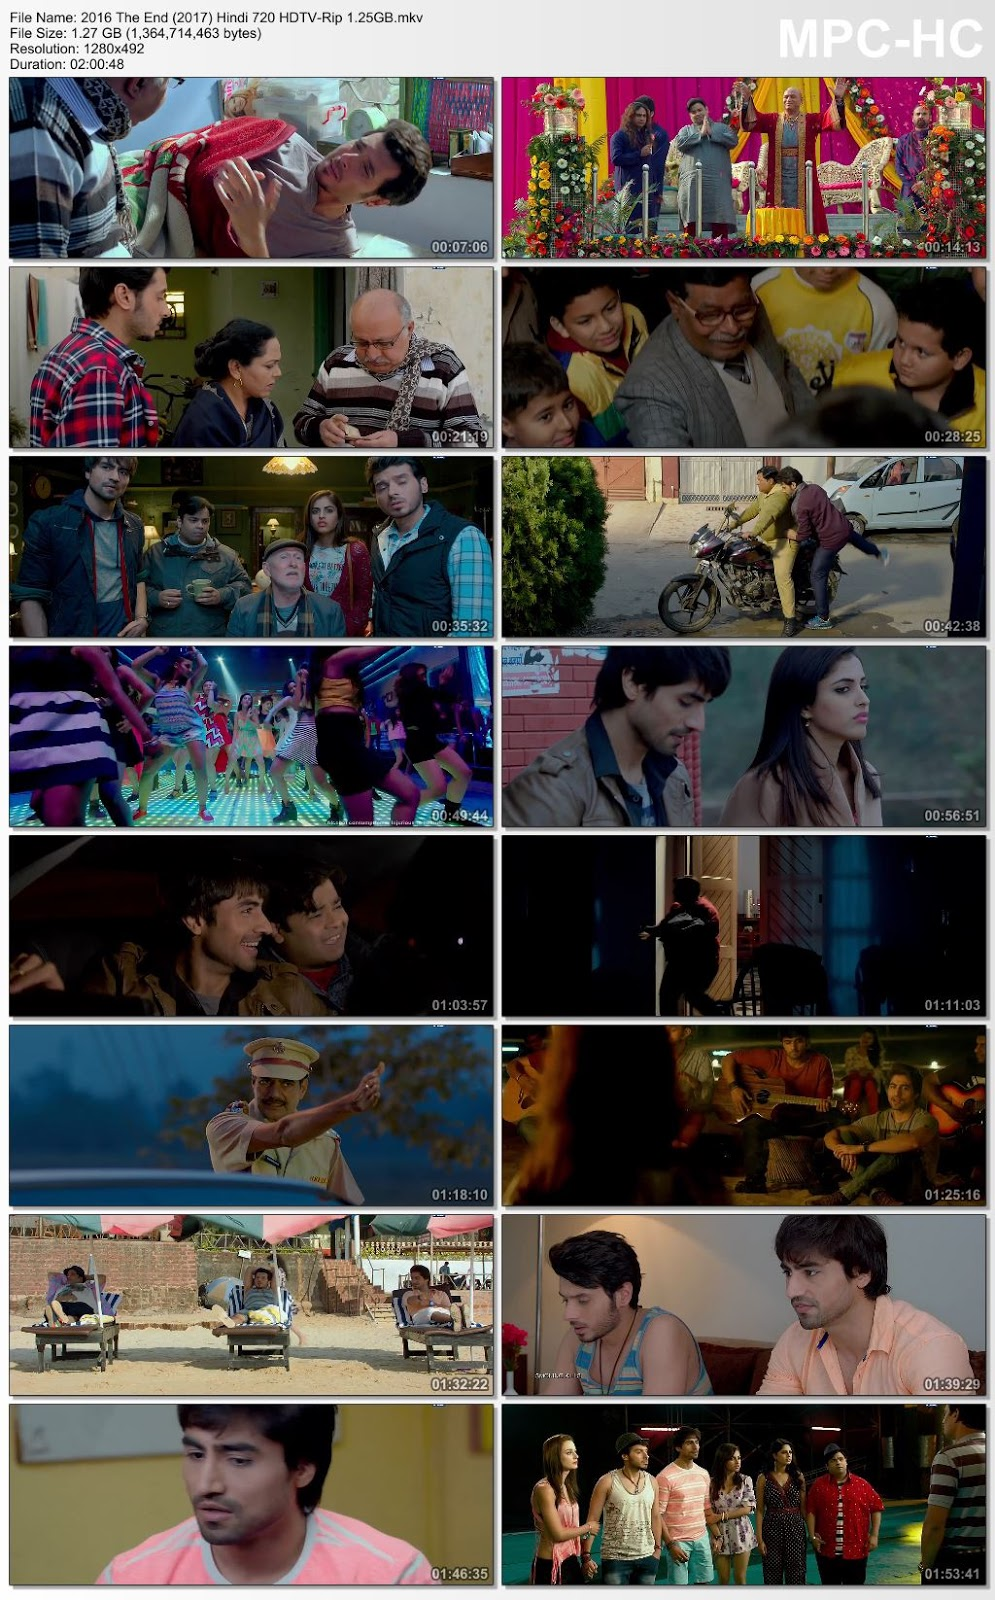 2016 The End (2017) Hindi 480p HDTV-Rip 350MB Desirehub